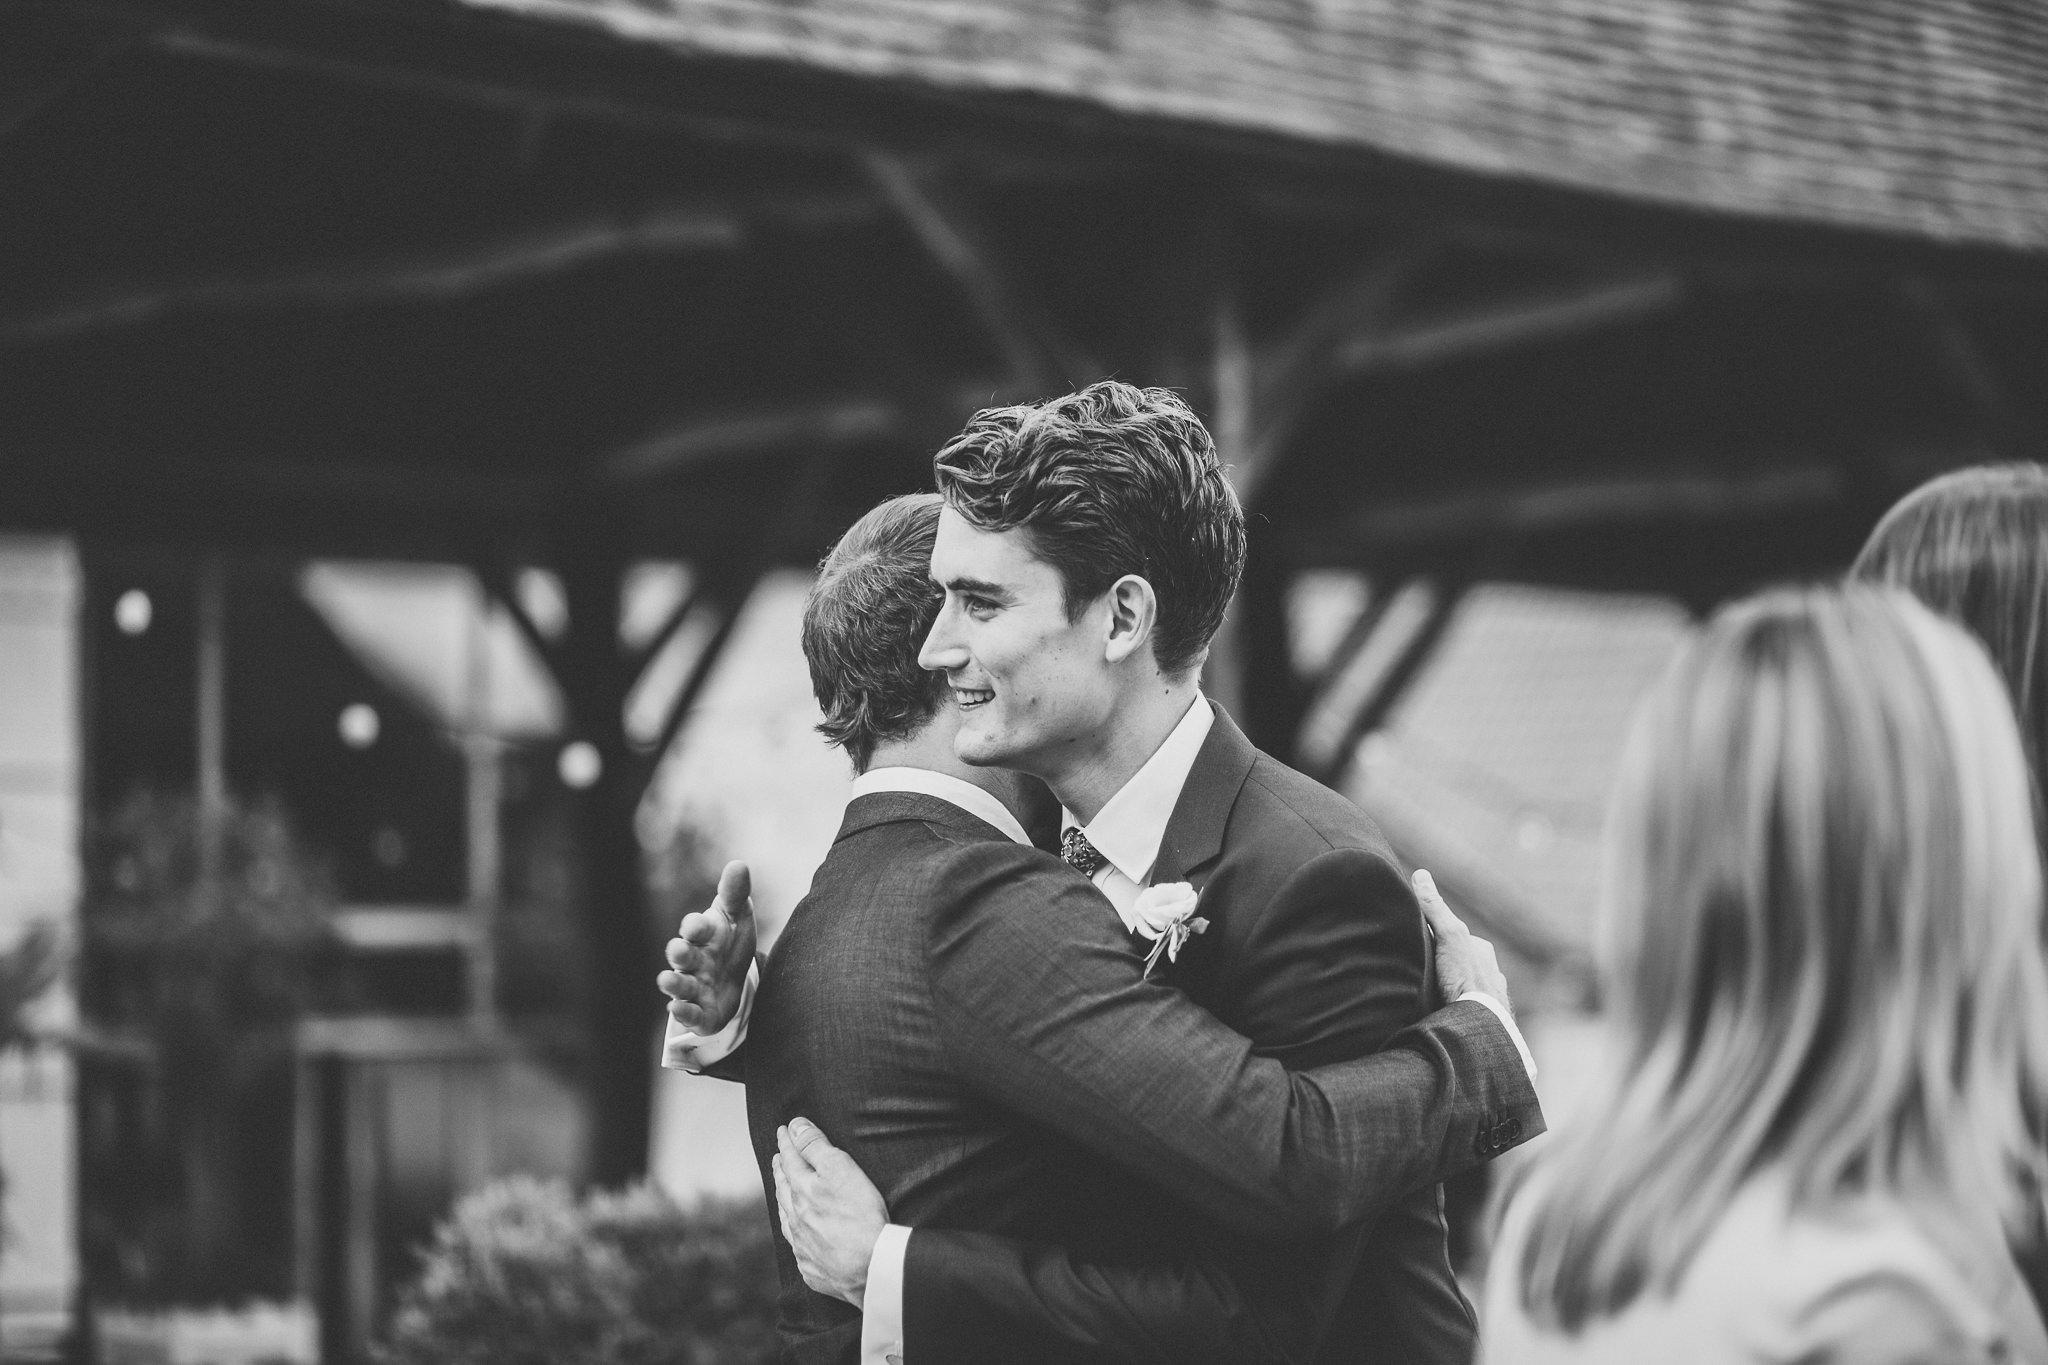 paul-marbrook-Gaynes-Park Wedding-Photographer-90020